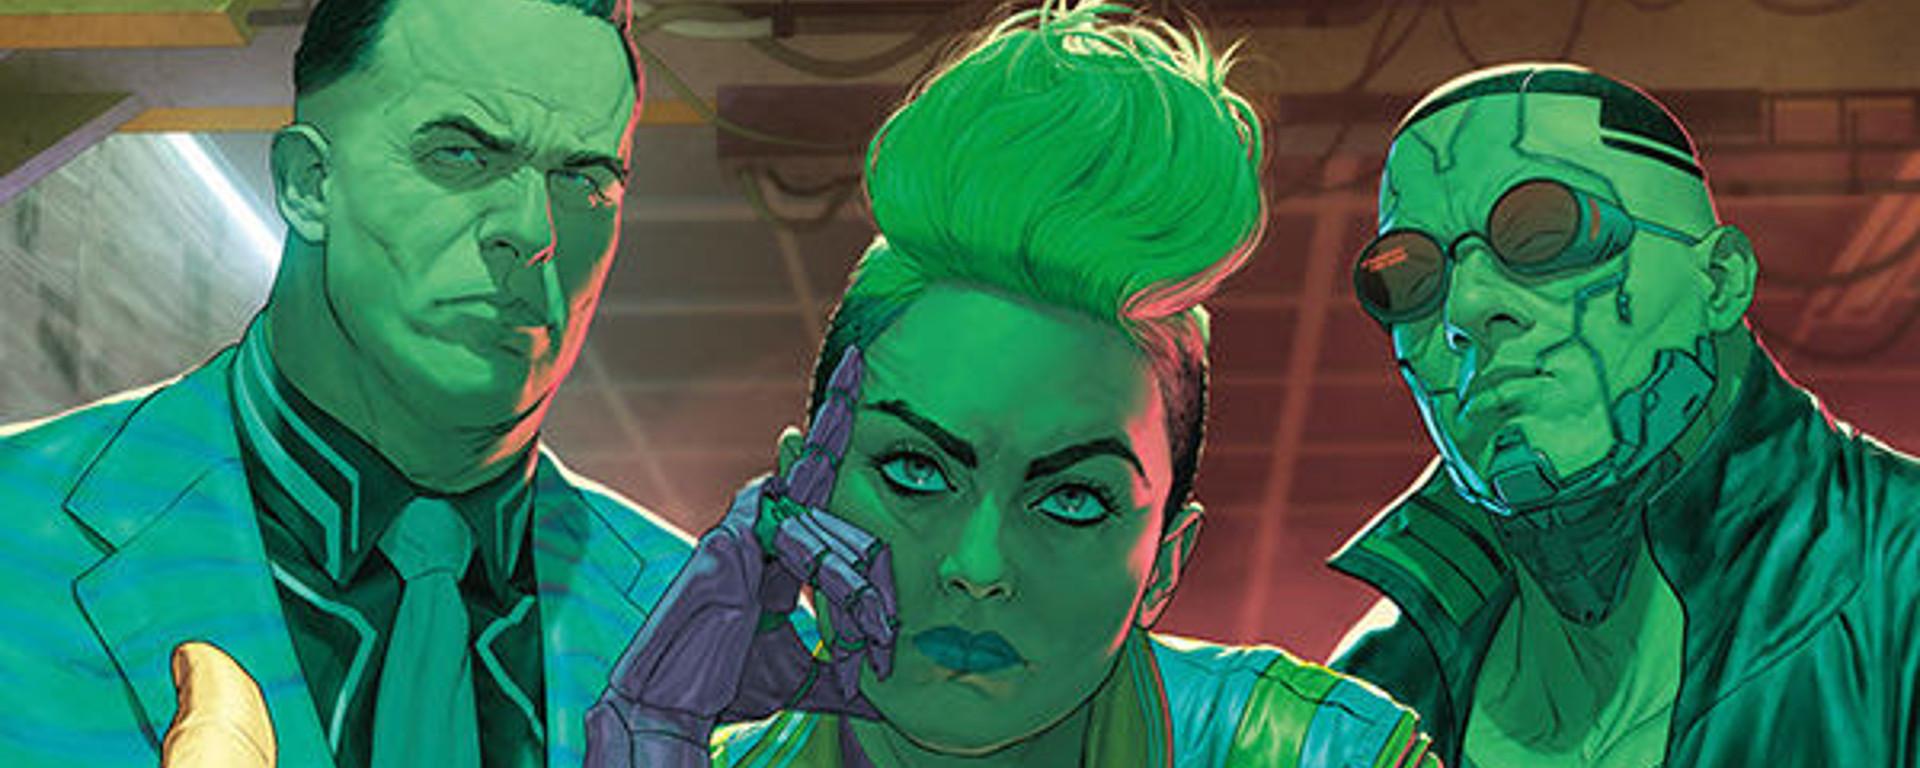 Cyberpunk 2077 You Have My Word 1 Header